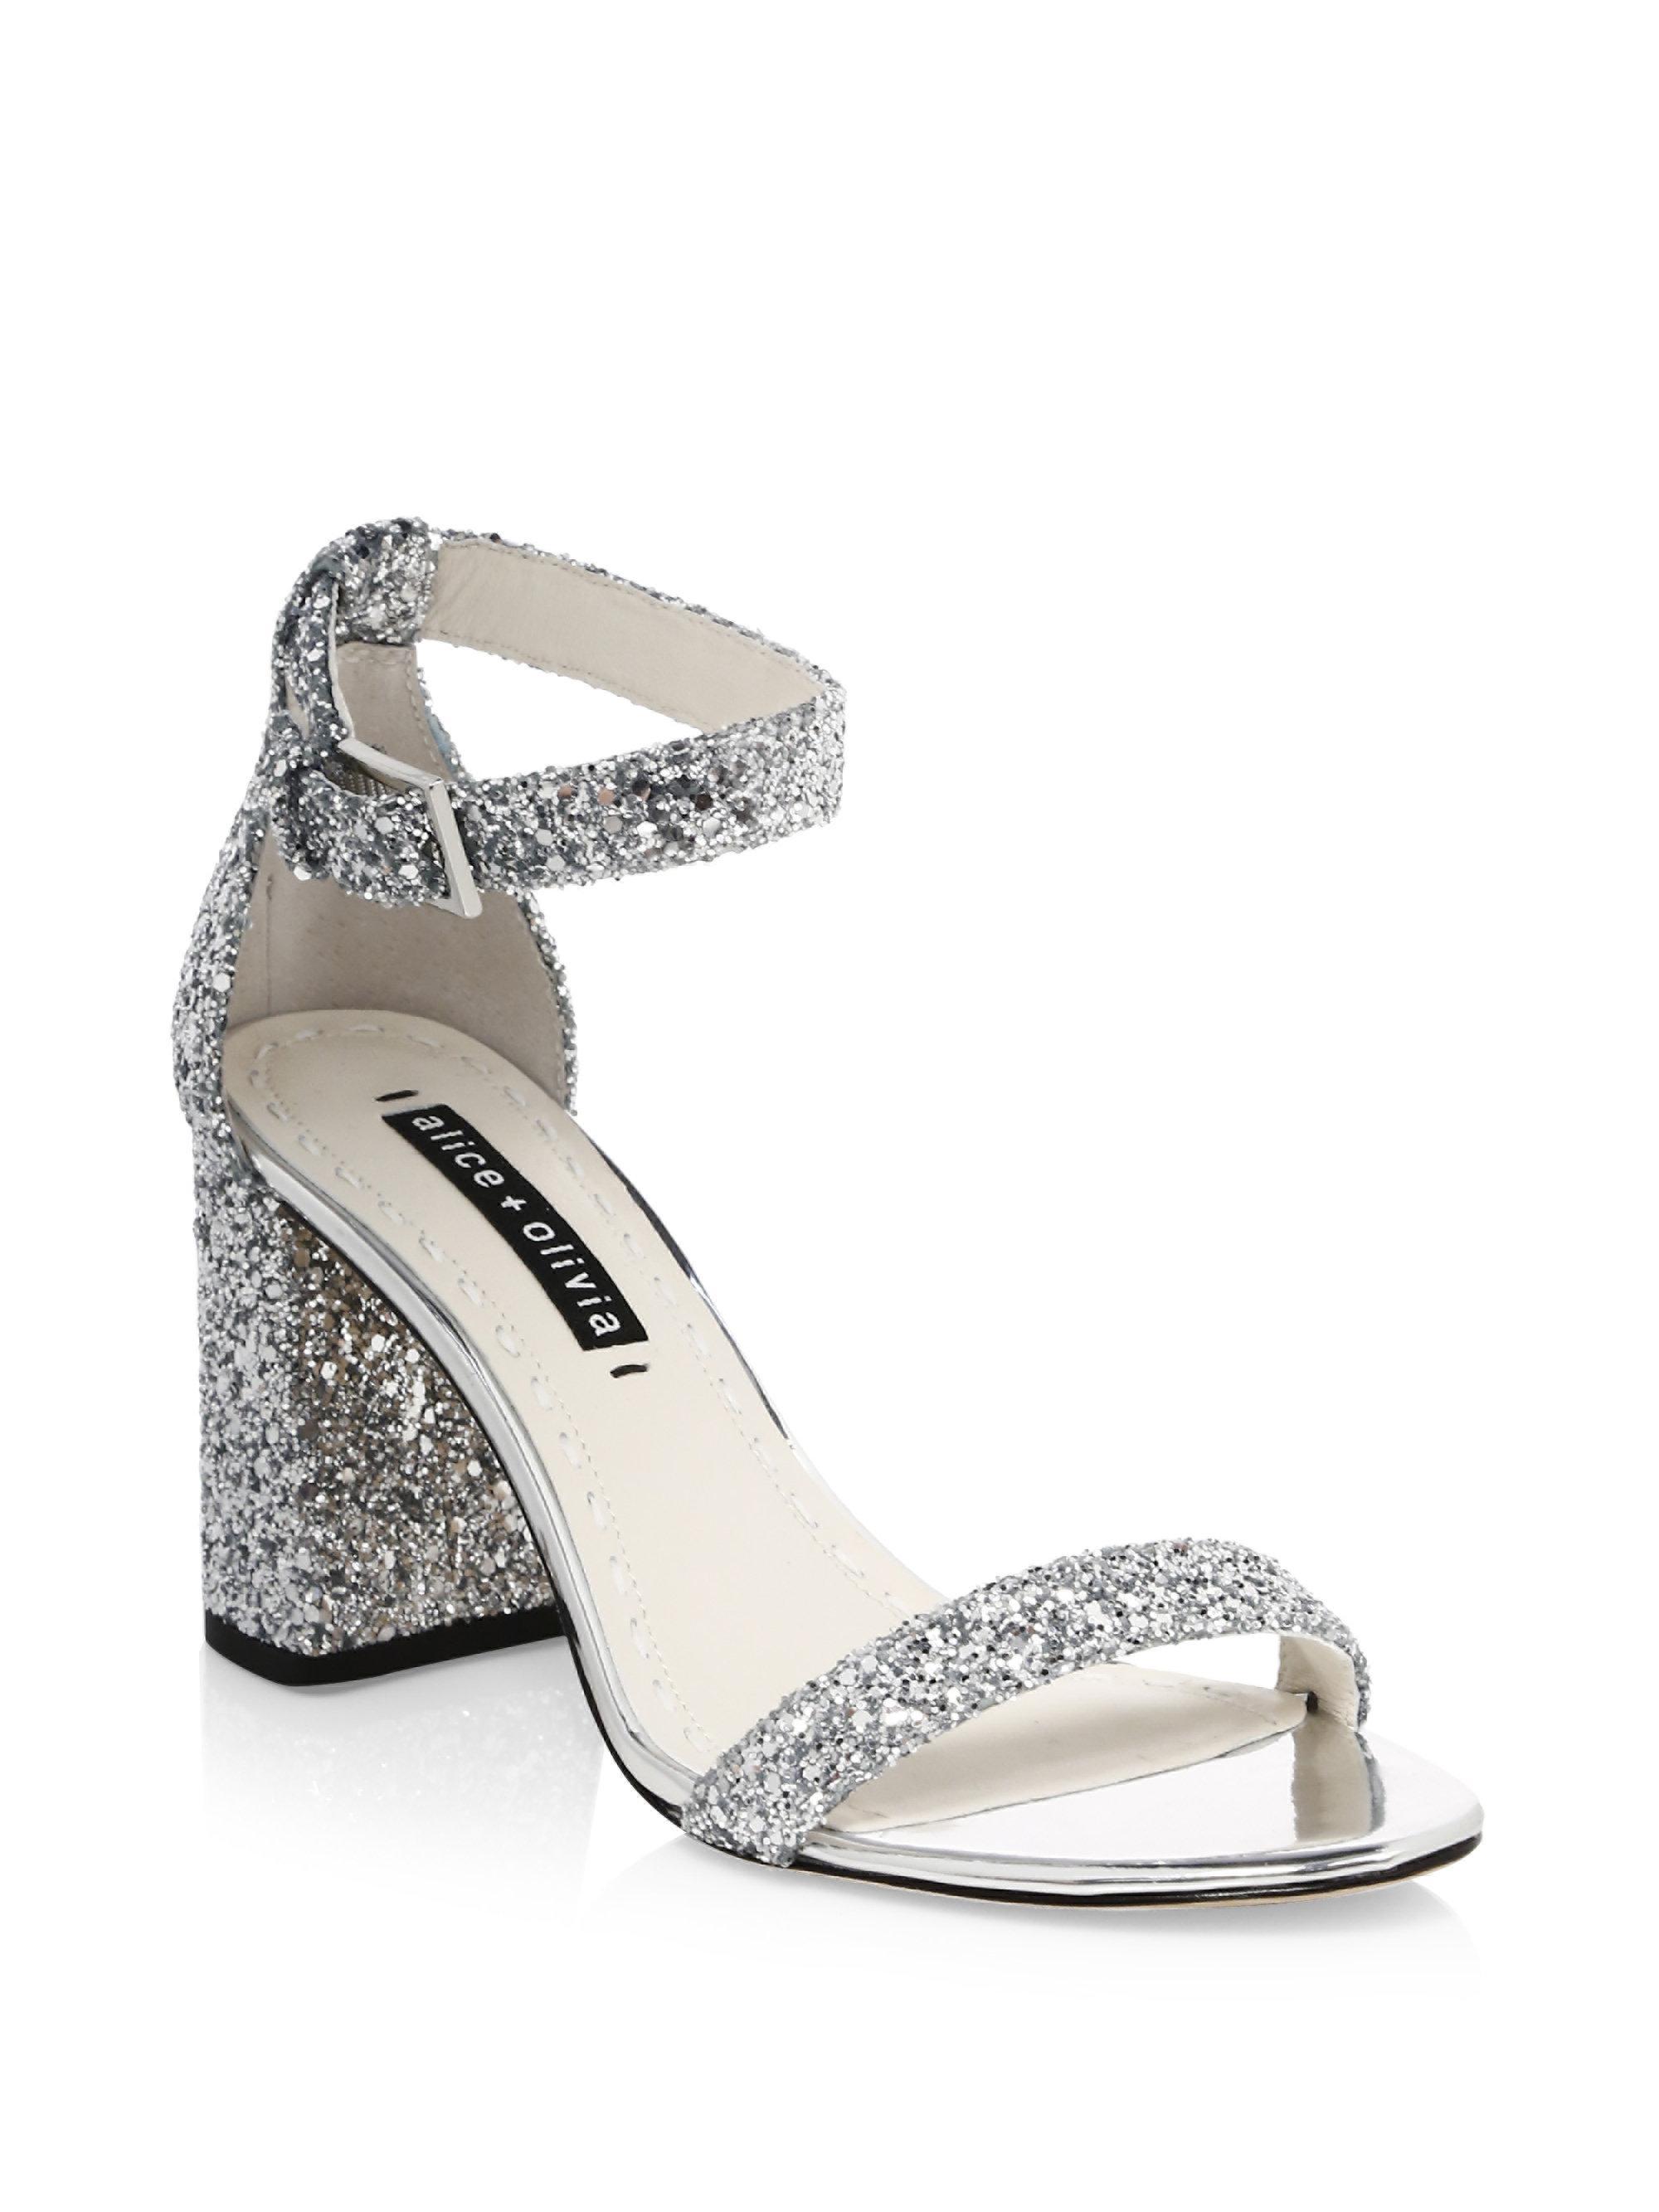 11b634f15c84 Alice + Olivia Lillian Glitter Leather Ankle-strap Heels in Metallic ...